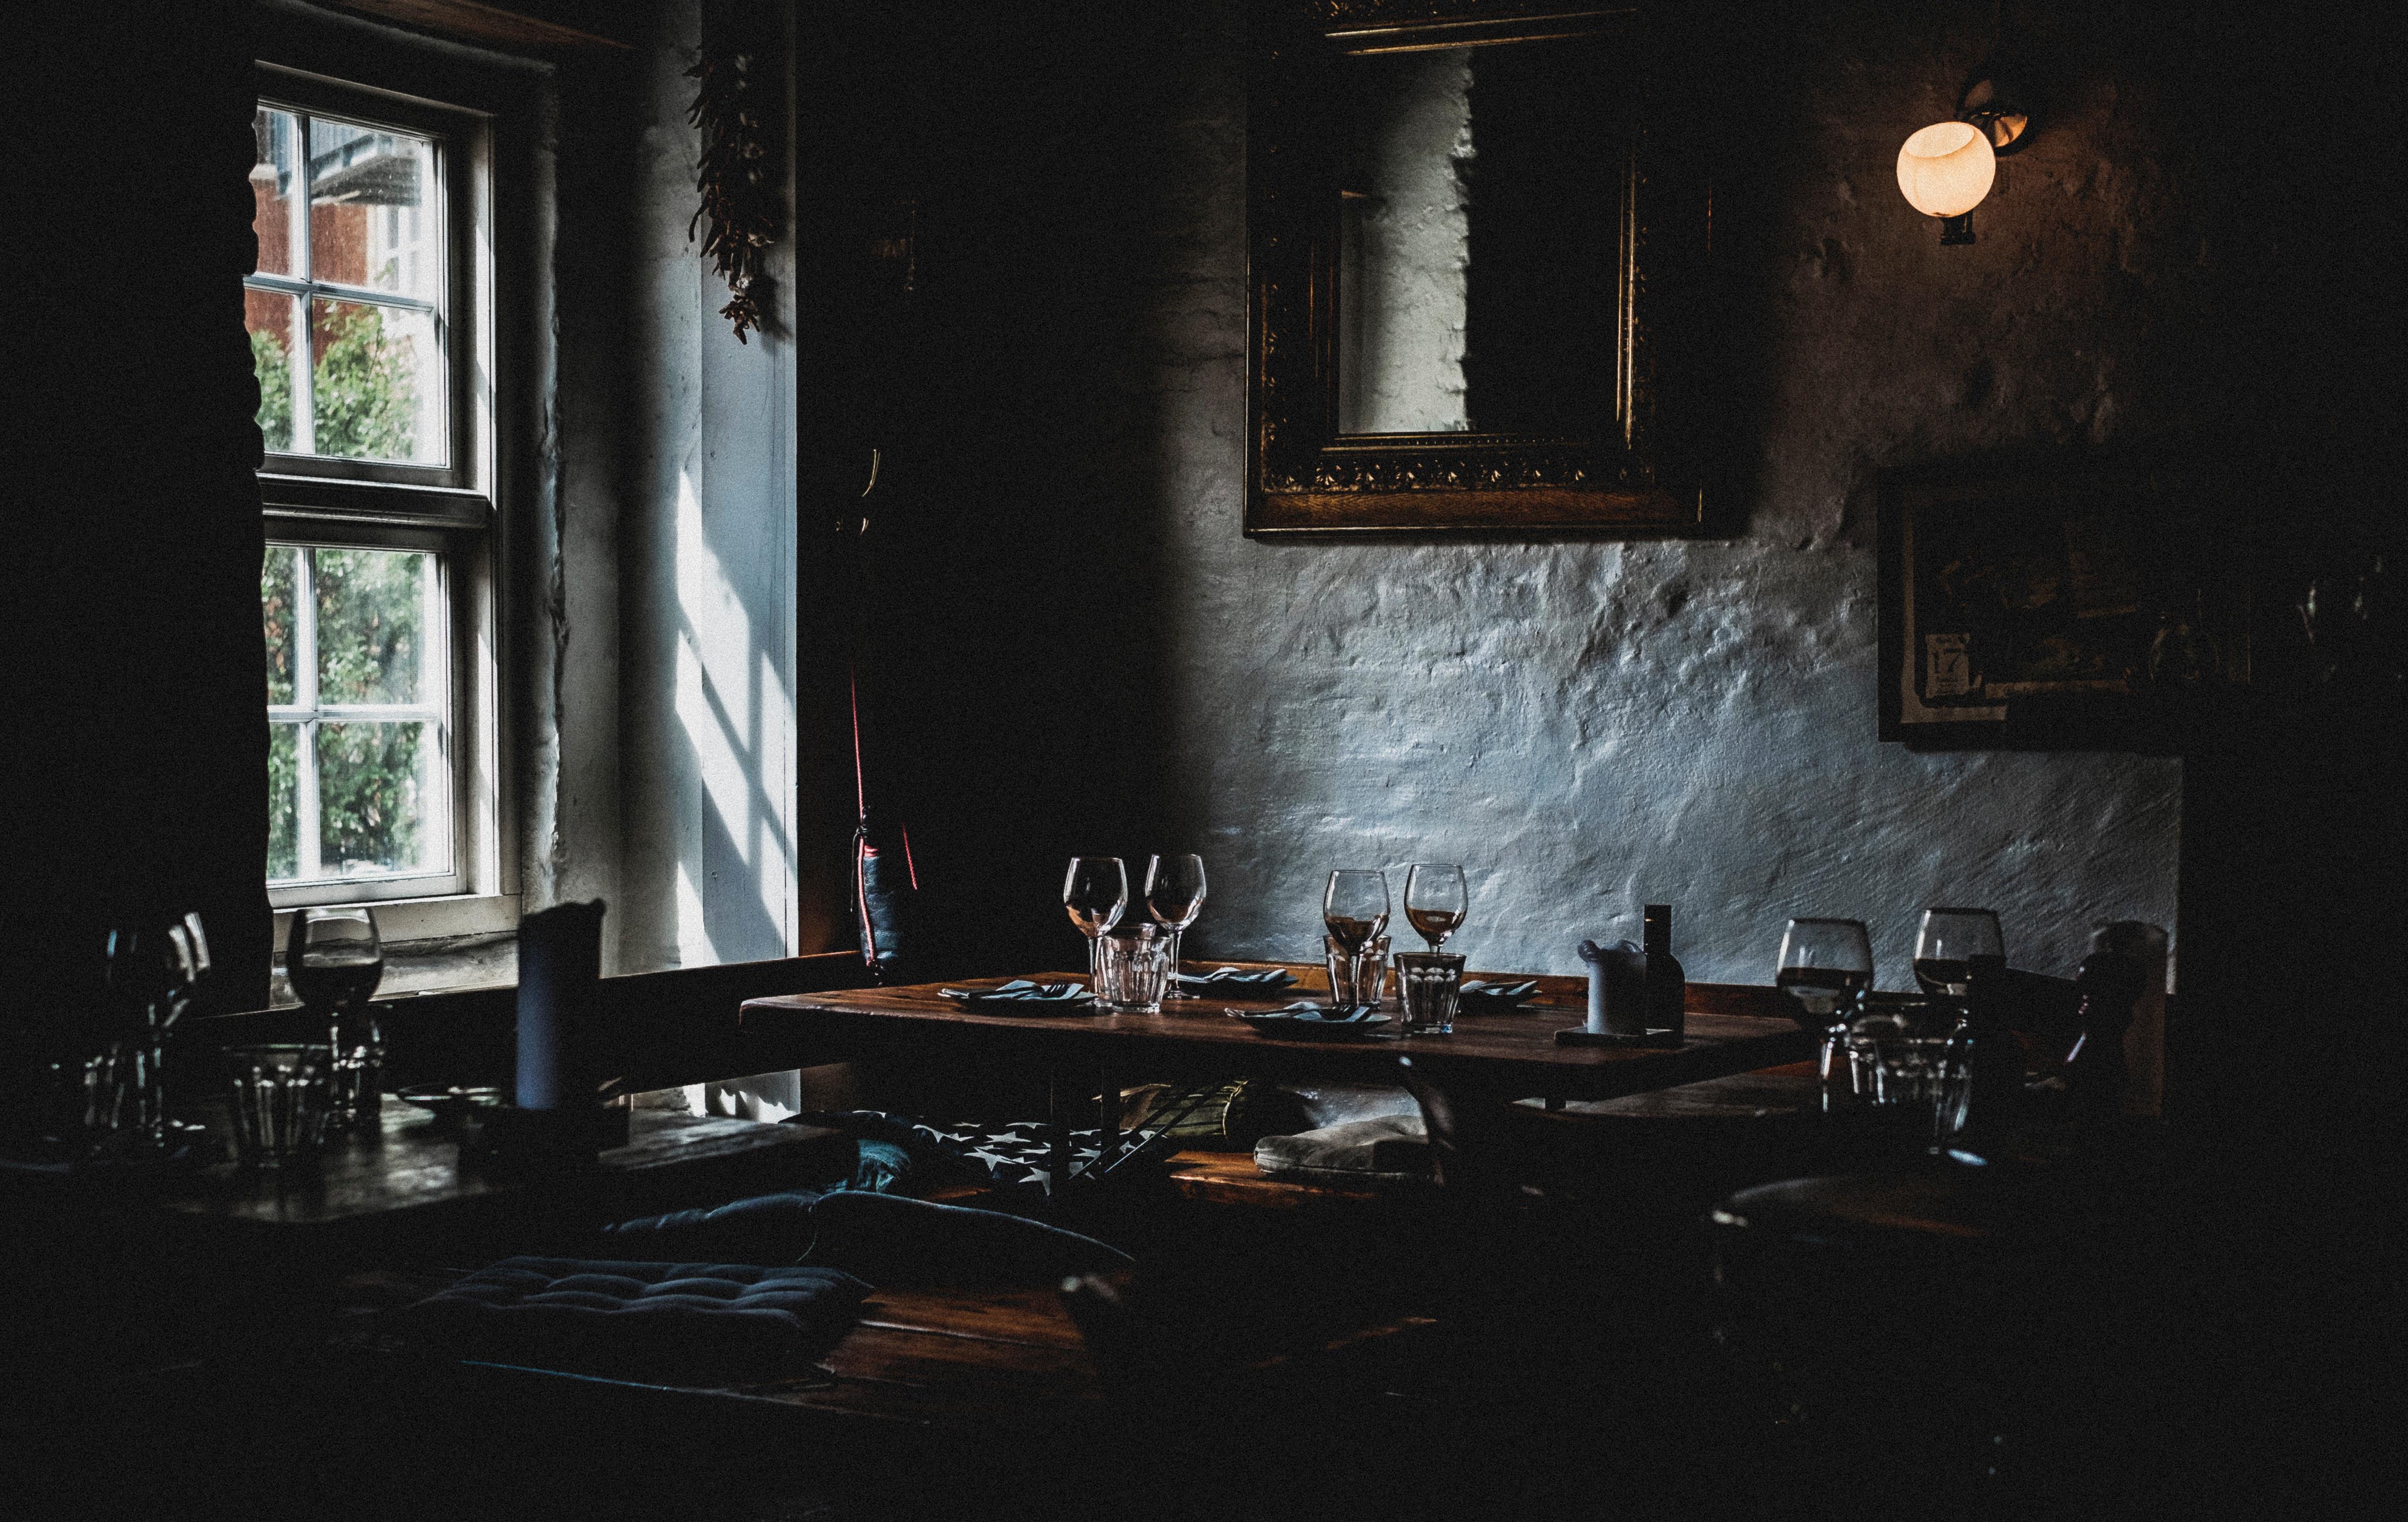 Free images light interior restaurant dark food